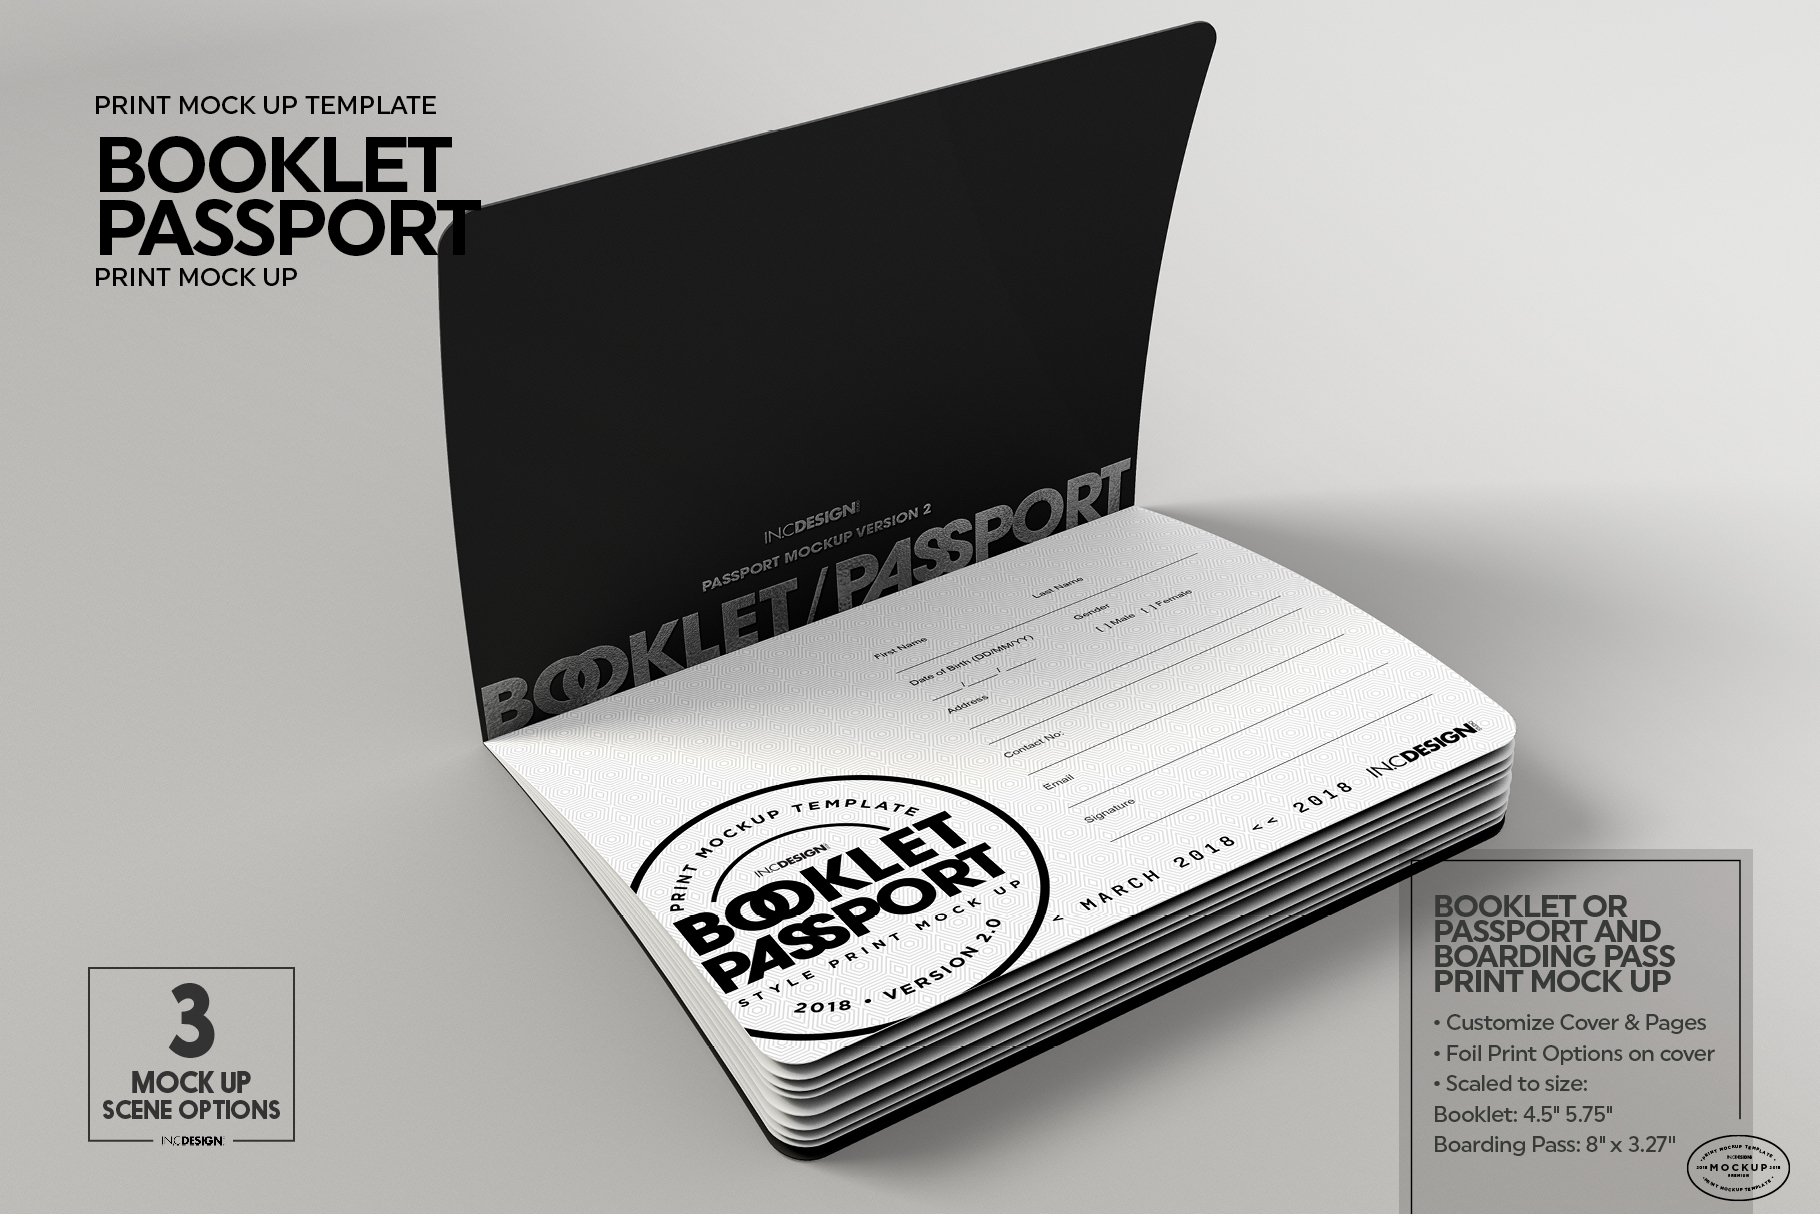 Booklet Passport Print MockUp example image 4